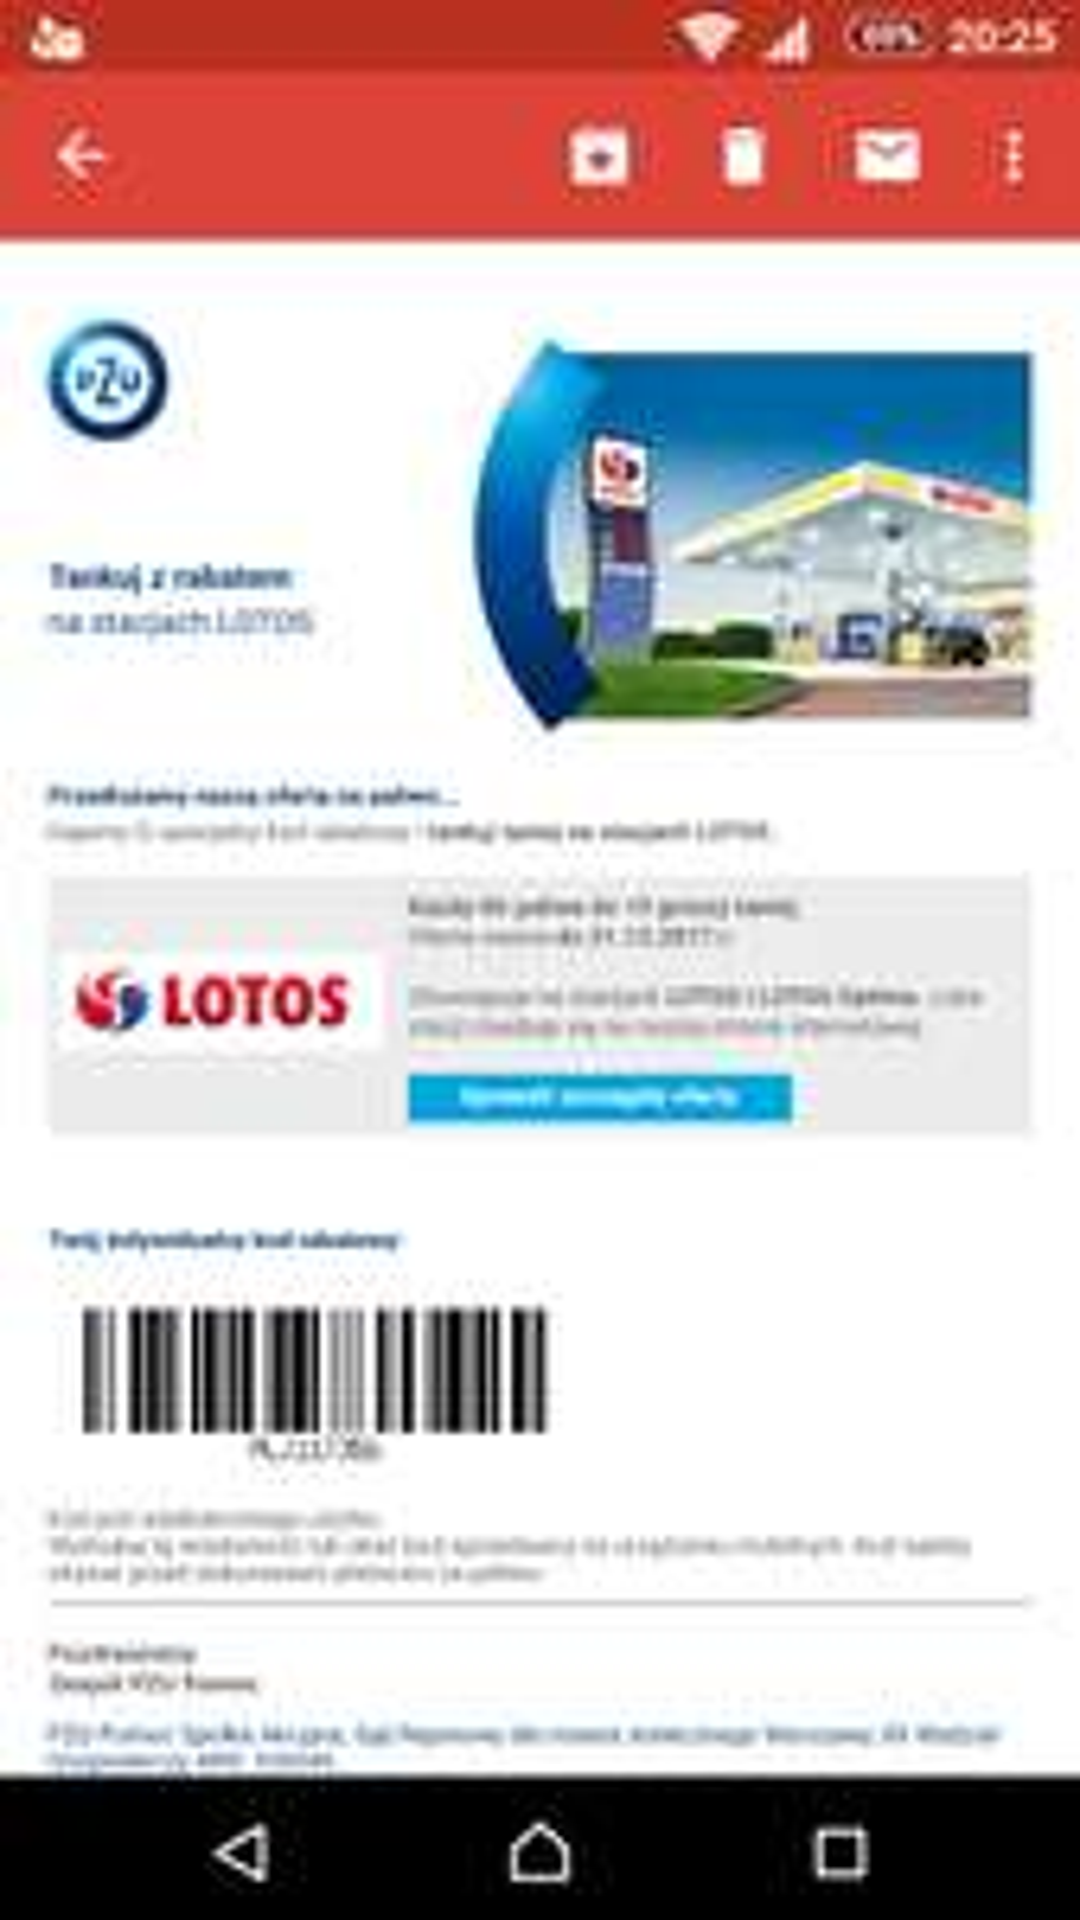 -10 gr/l paliwa oraz 5 gr LPG Lotos - kod z PZU